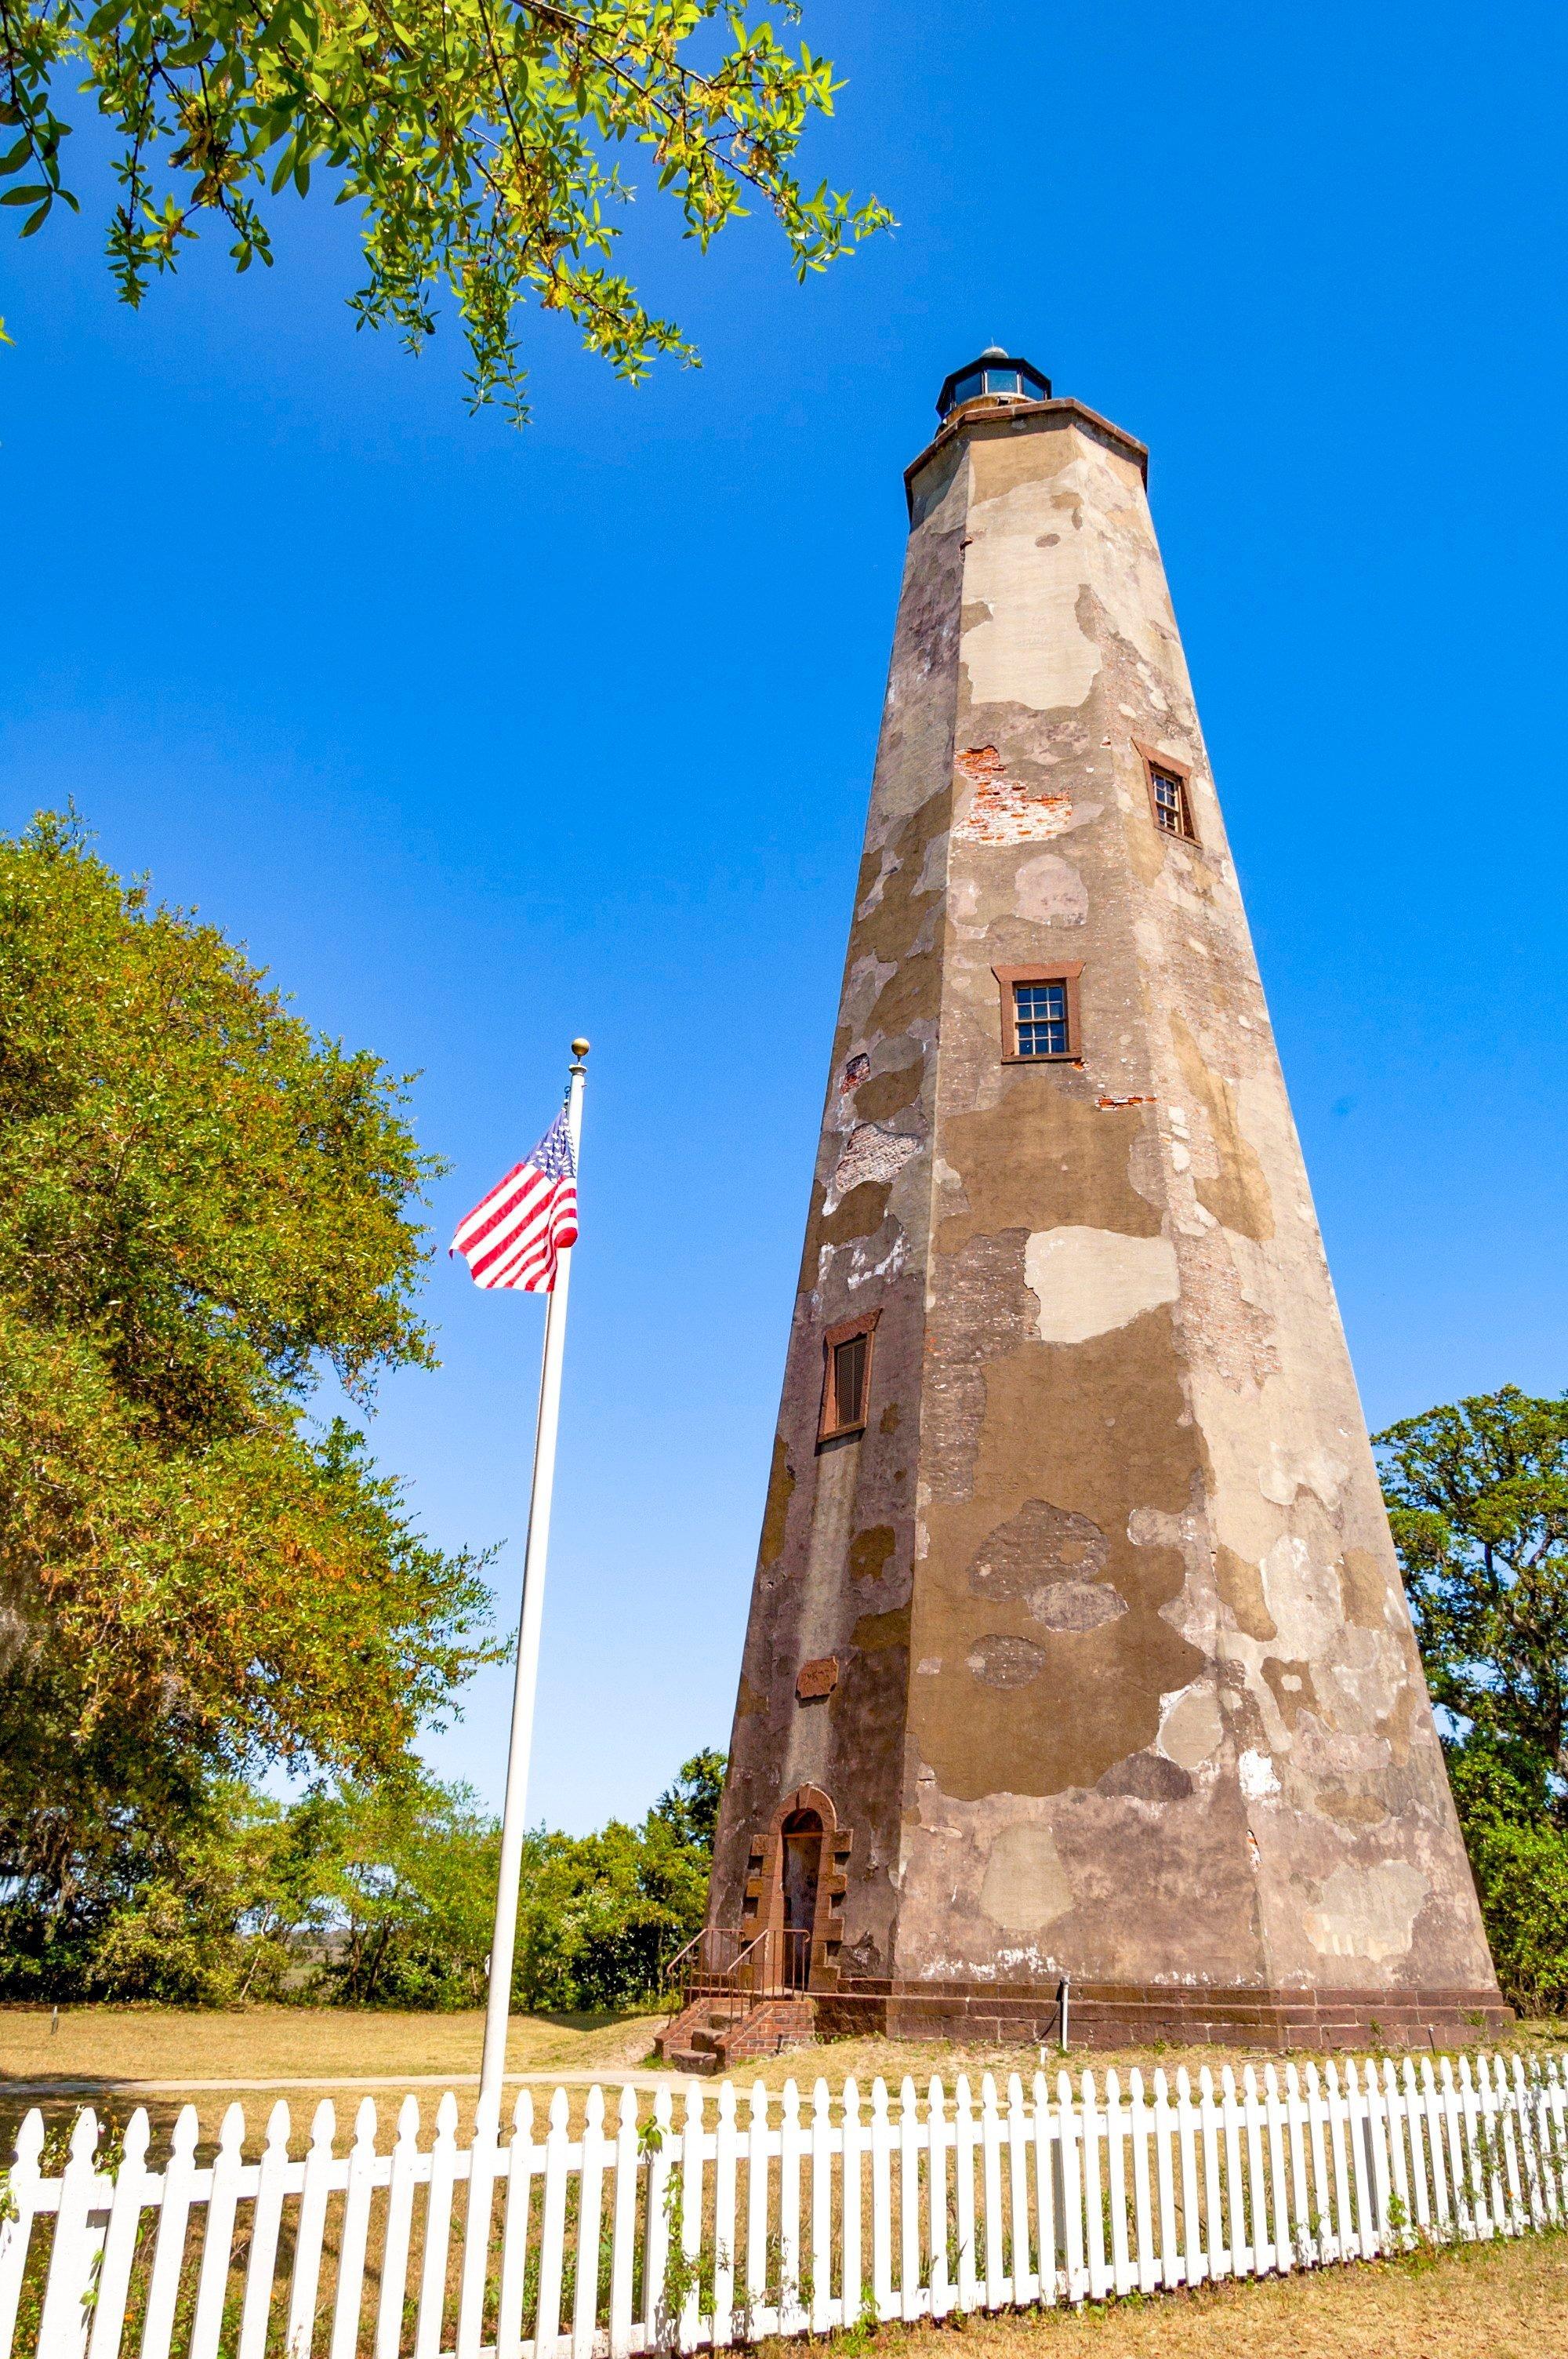 Old Baldy lighthouse on Bald Head Island, North Carolina